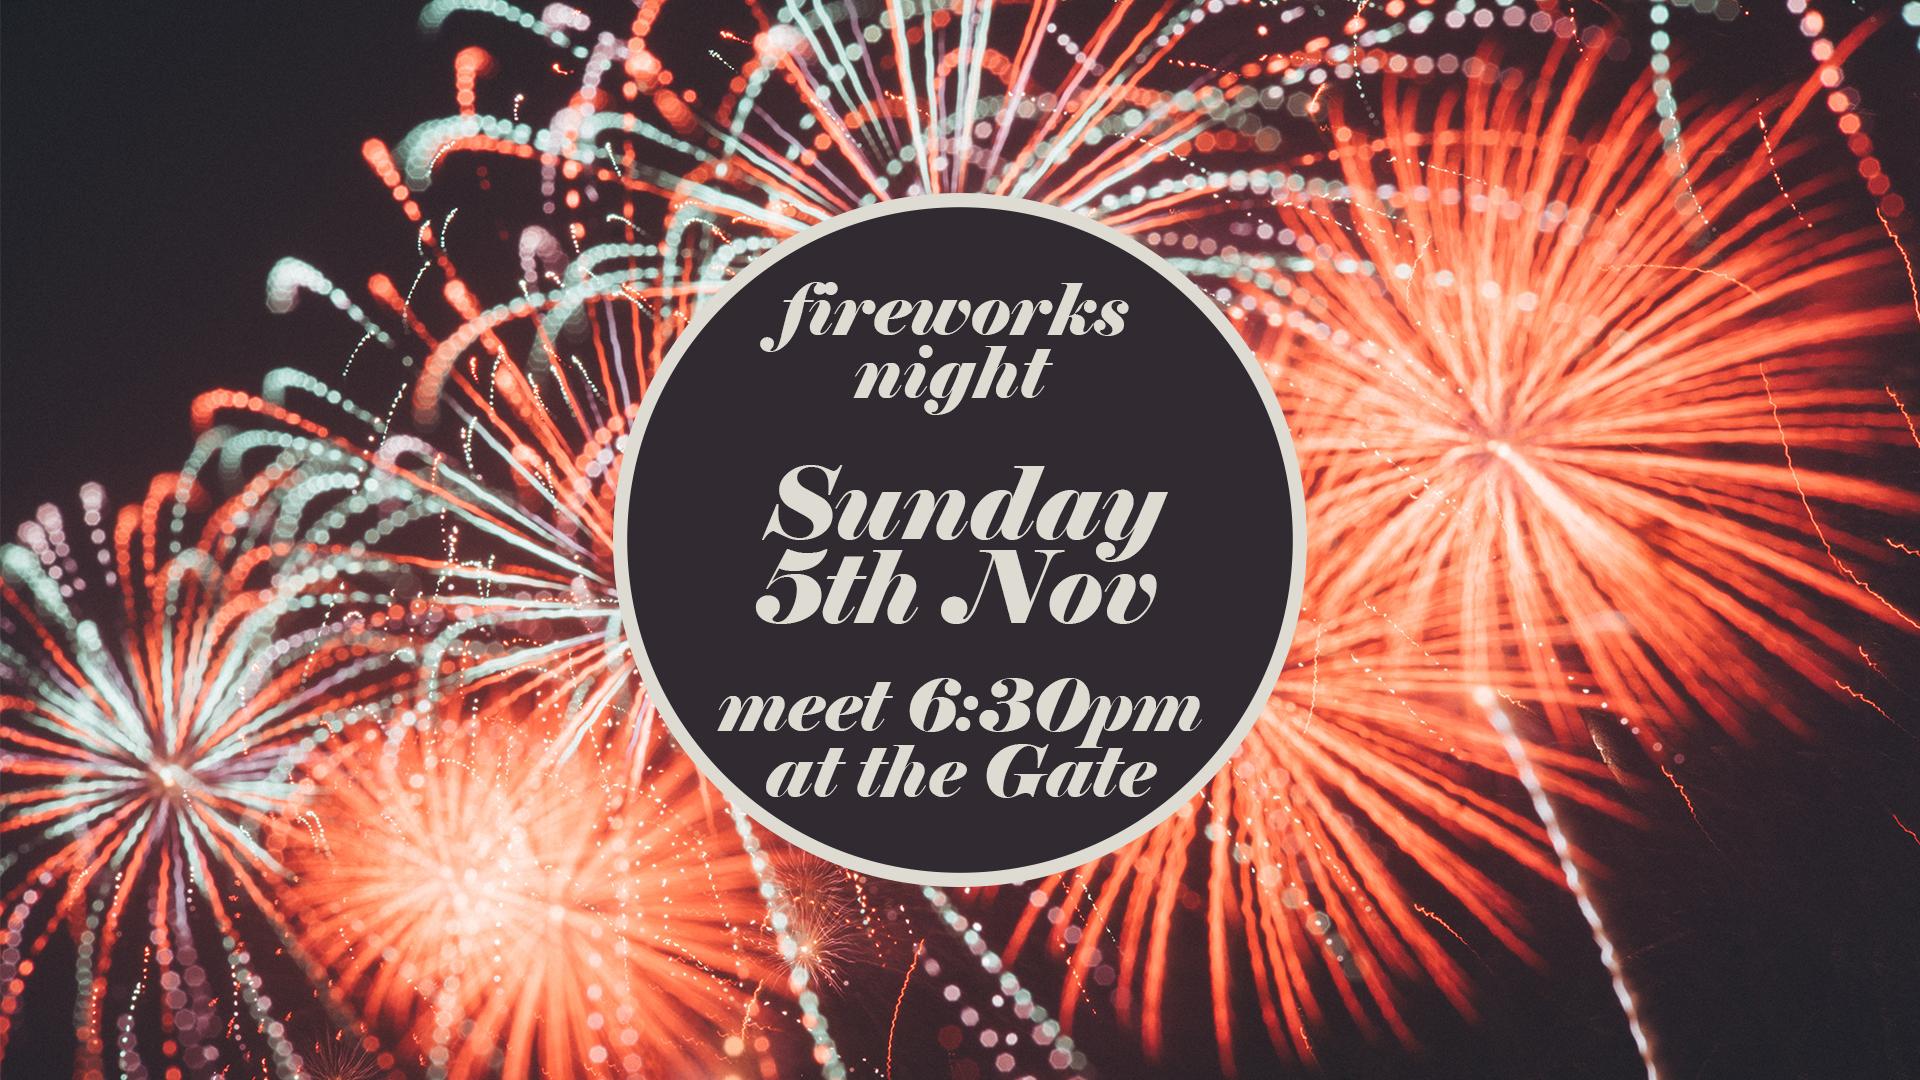 fireworks night social 2017.jpg